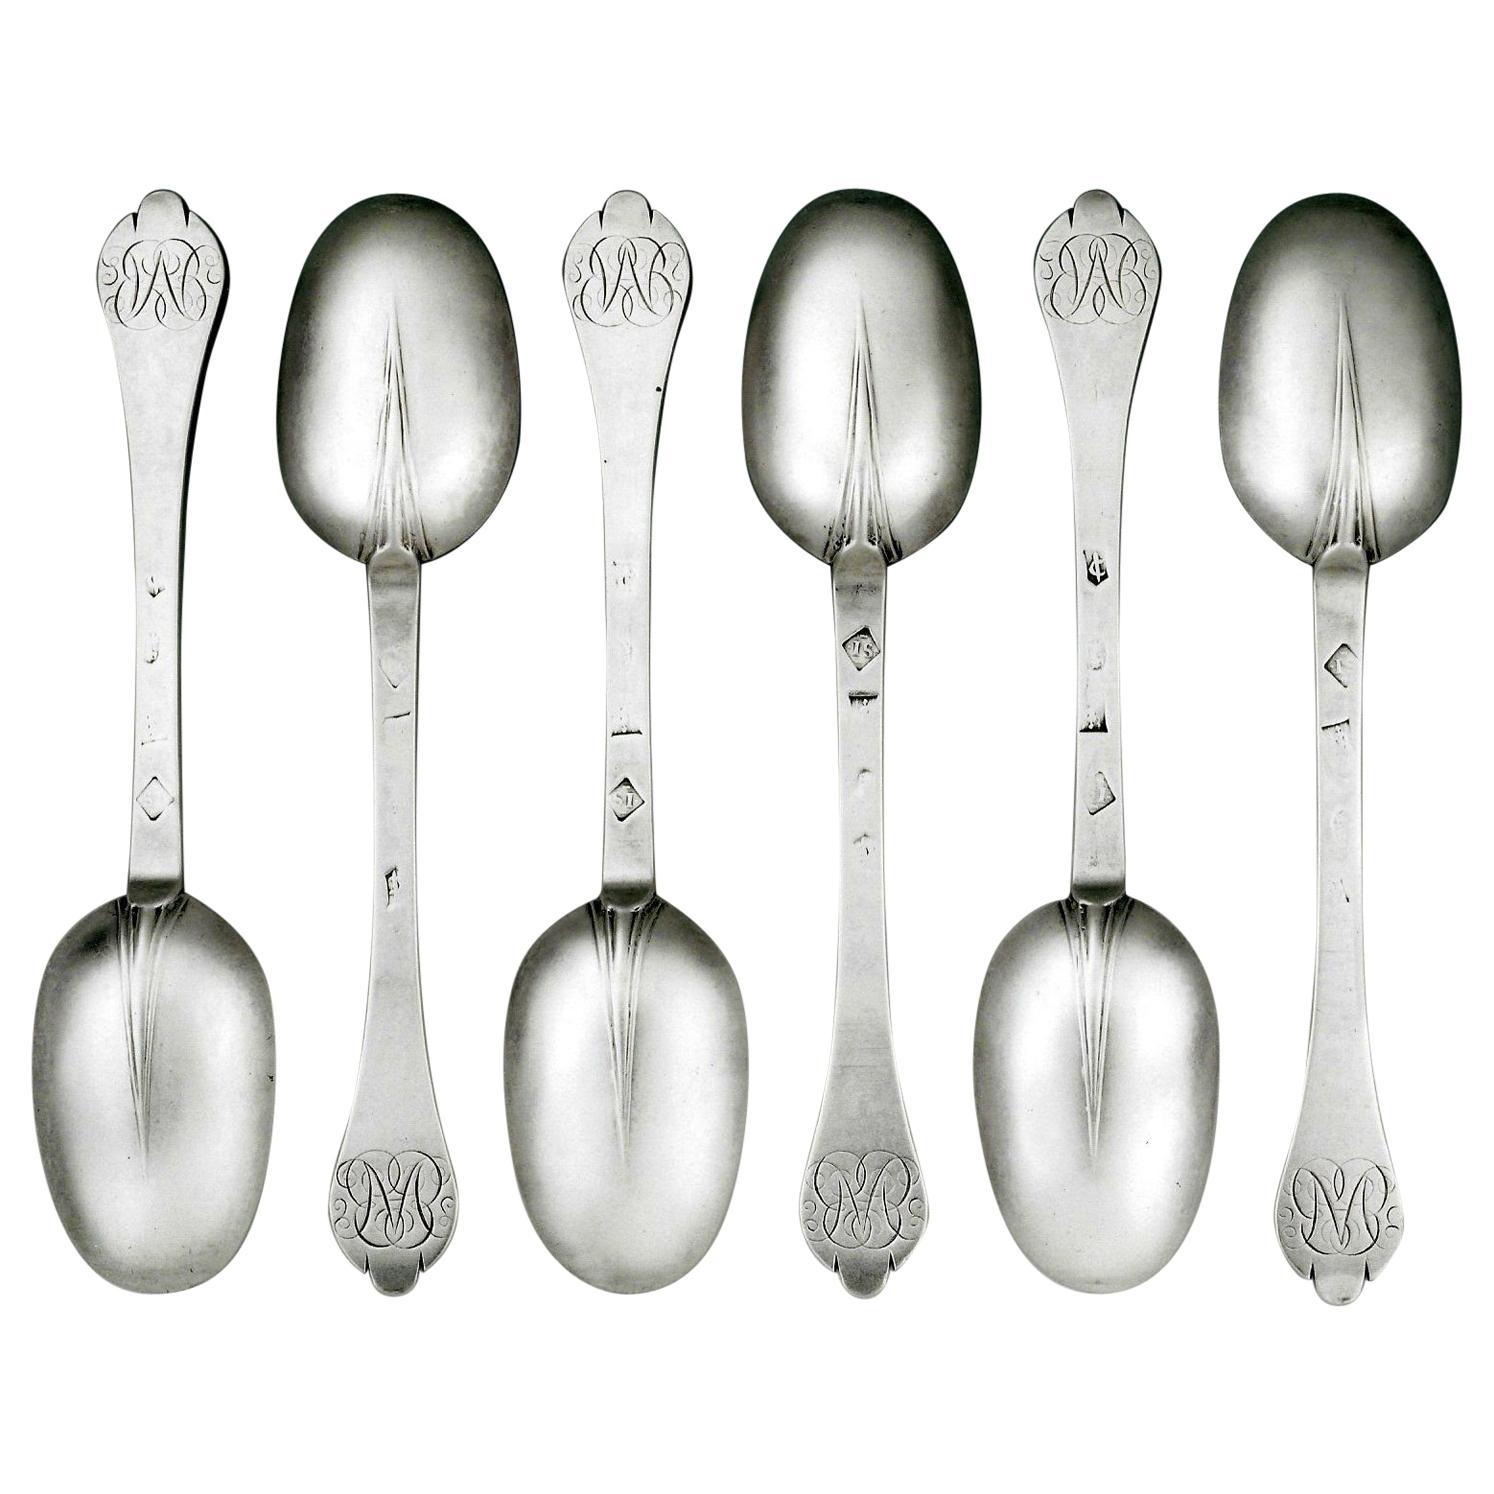 Set of Six William III Trefid Spoons made in London by Joyce Issod in 1697